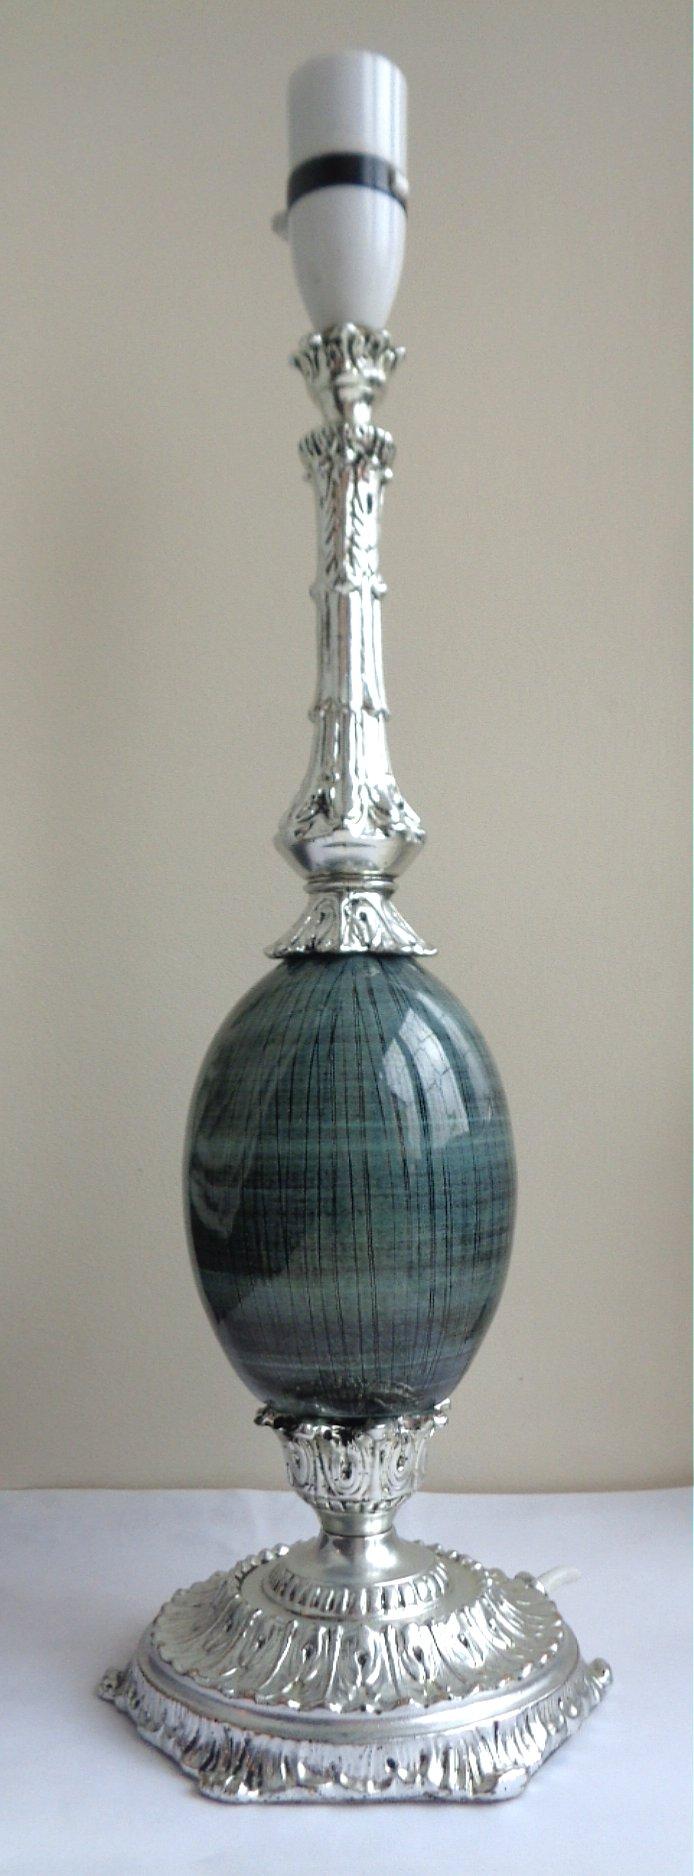 Rye Pottery lamp Rlb110